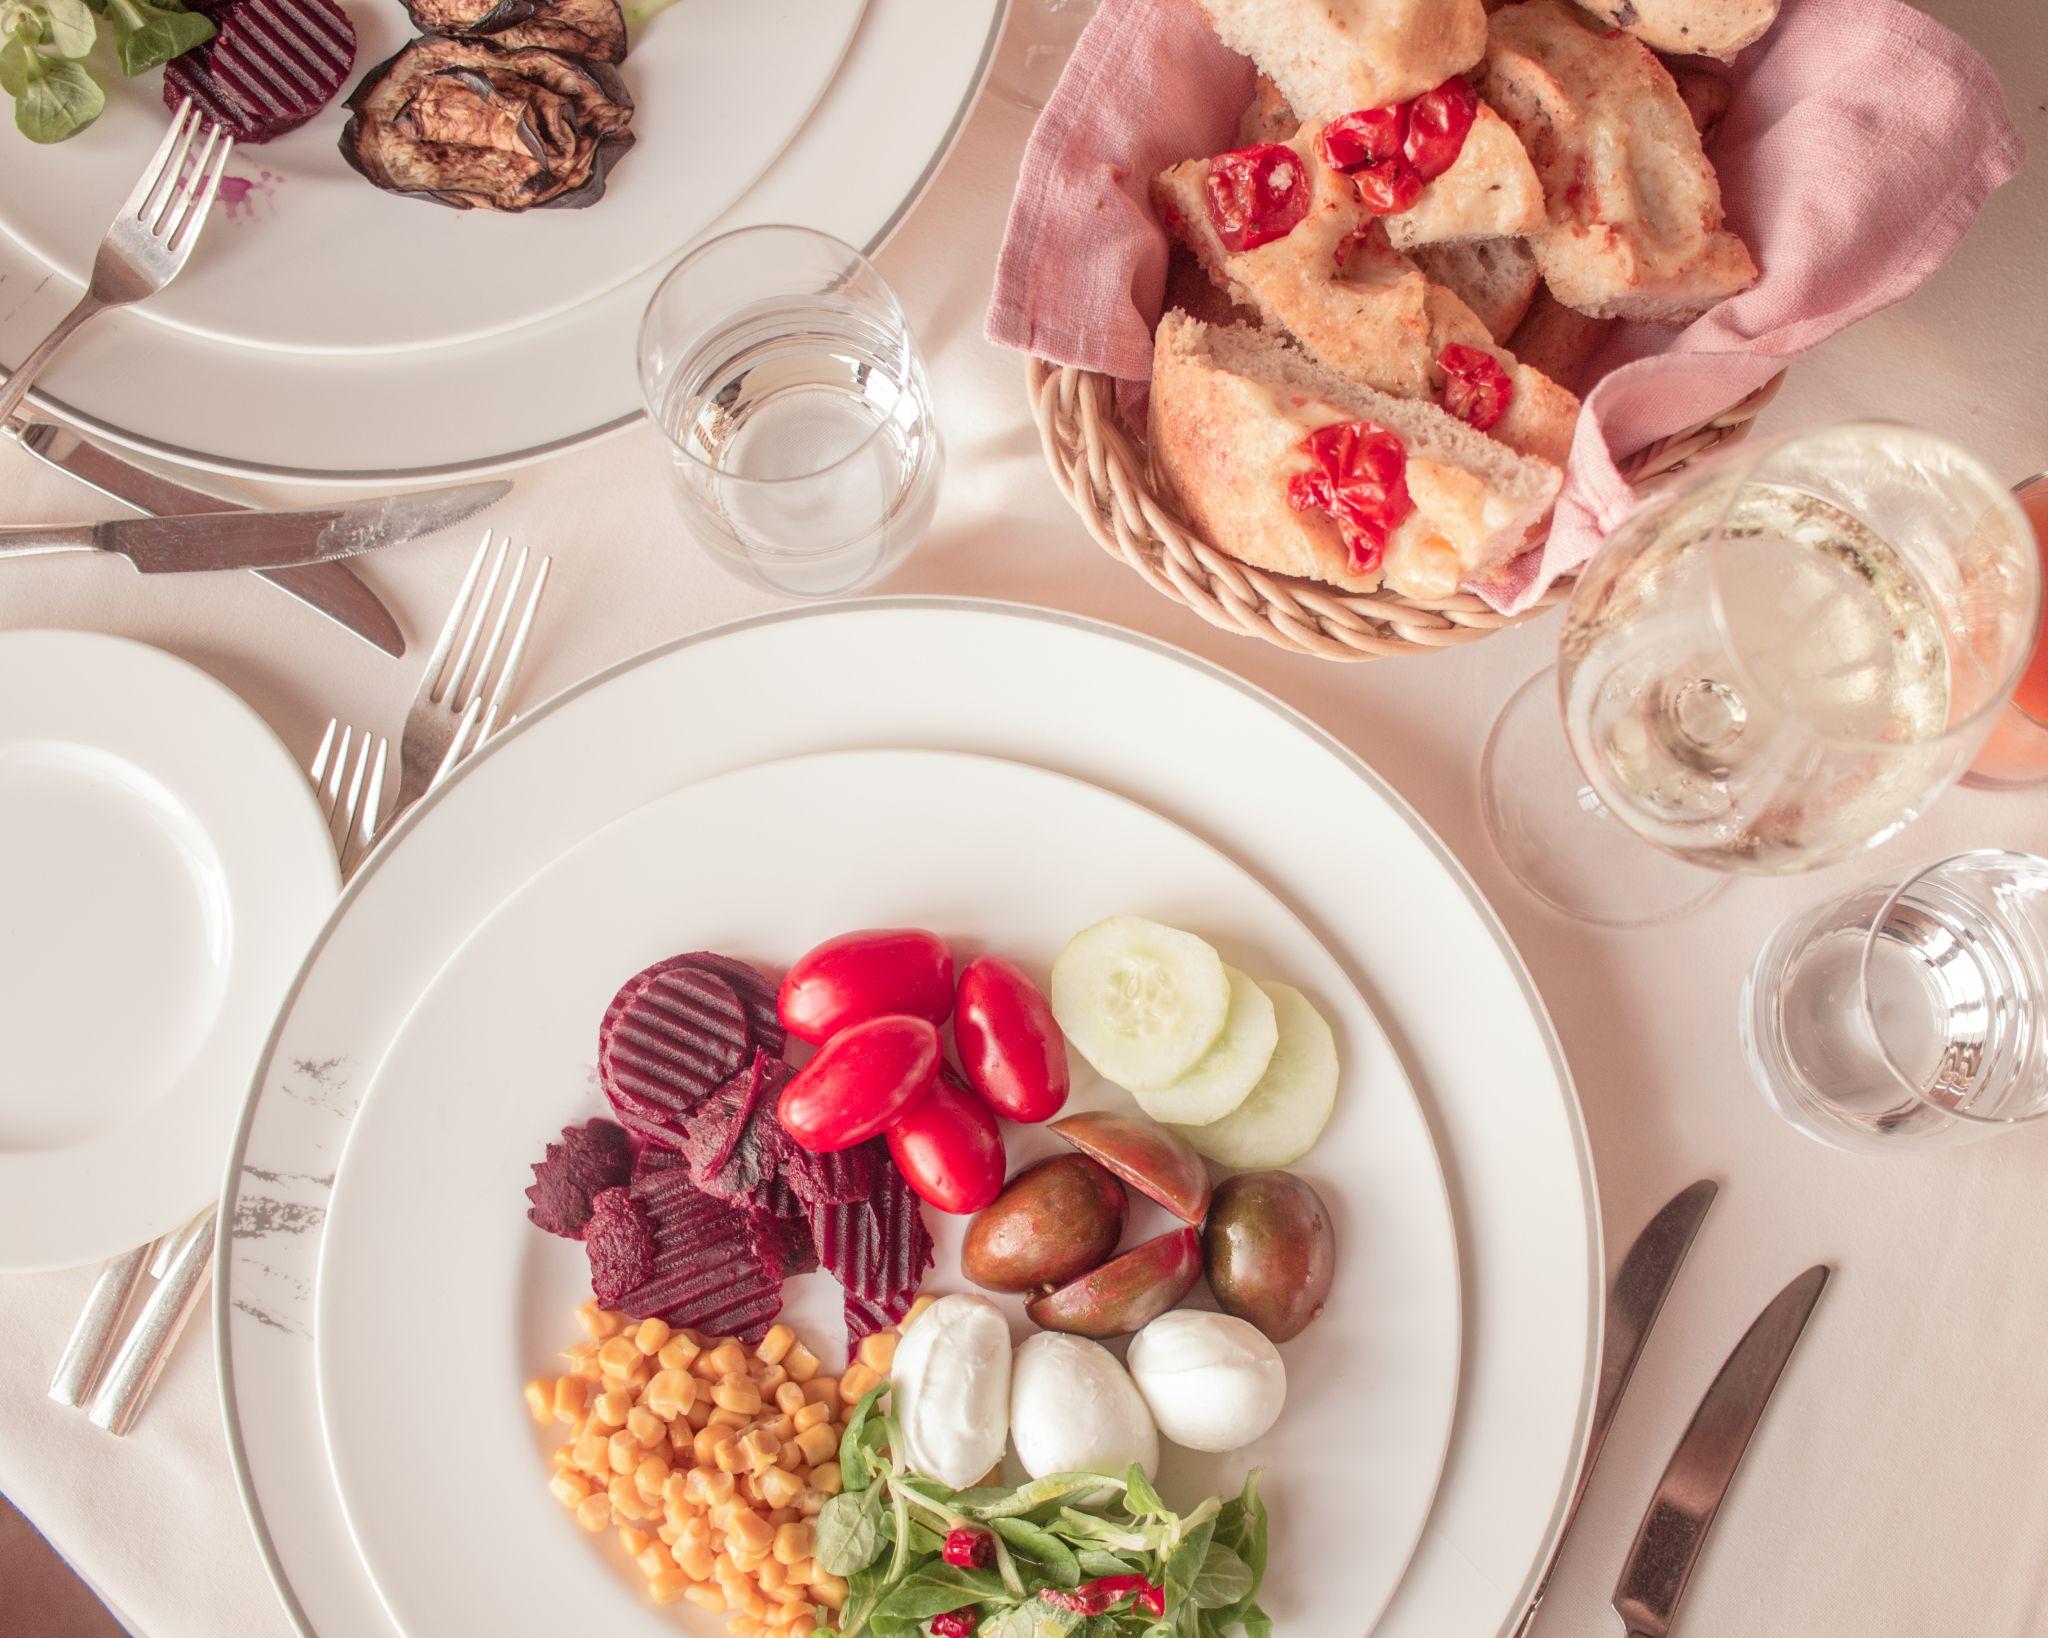 Adler Thermae Hotel Tuscany Hospitality Brand Hotel Travel Photography tuscan salad